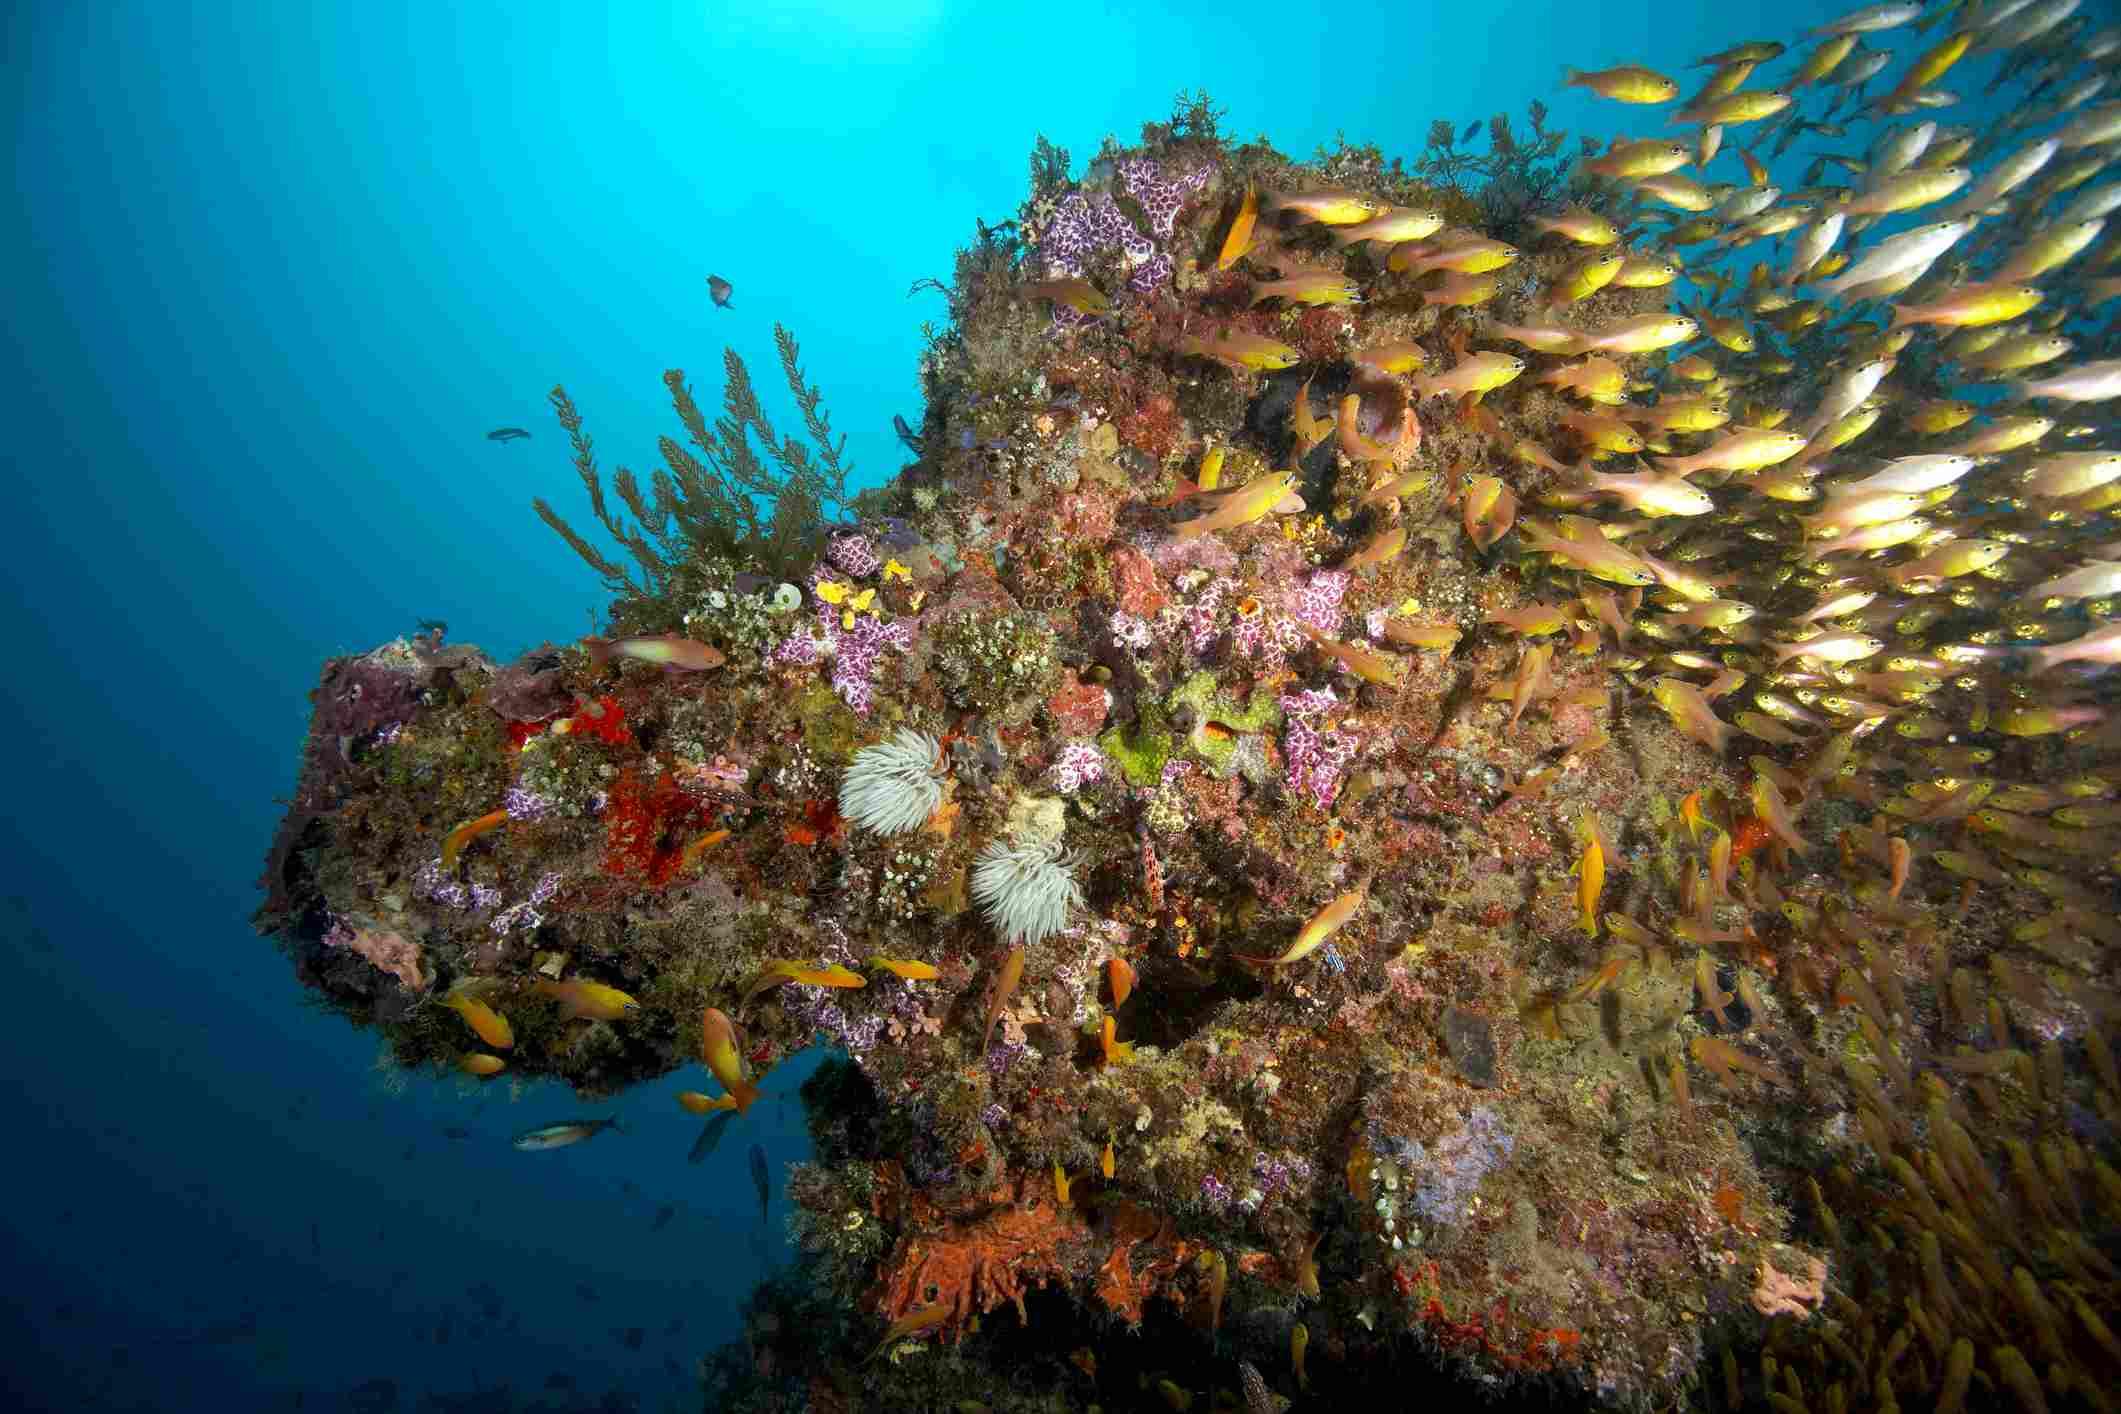 Zanzibar Reef, Tanzania